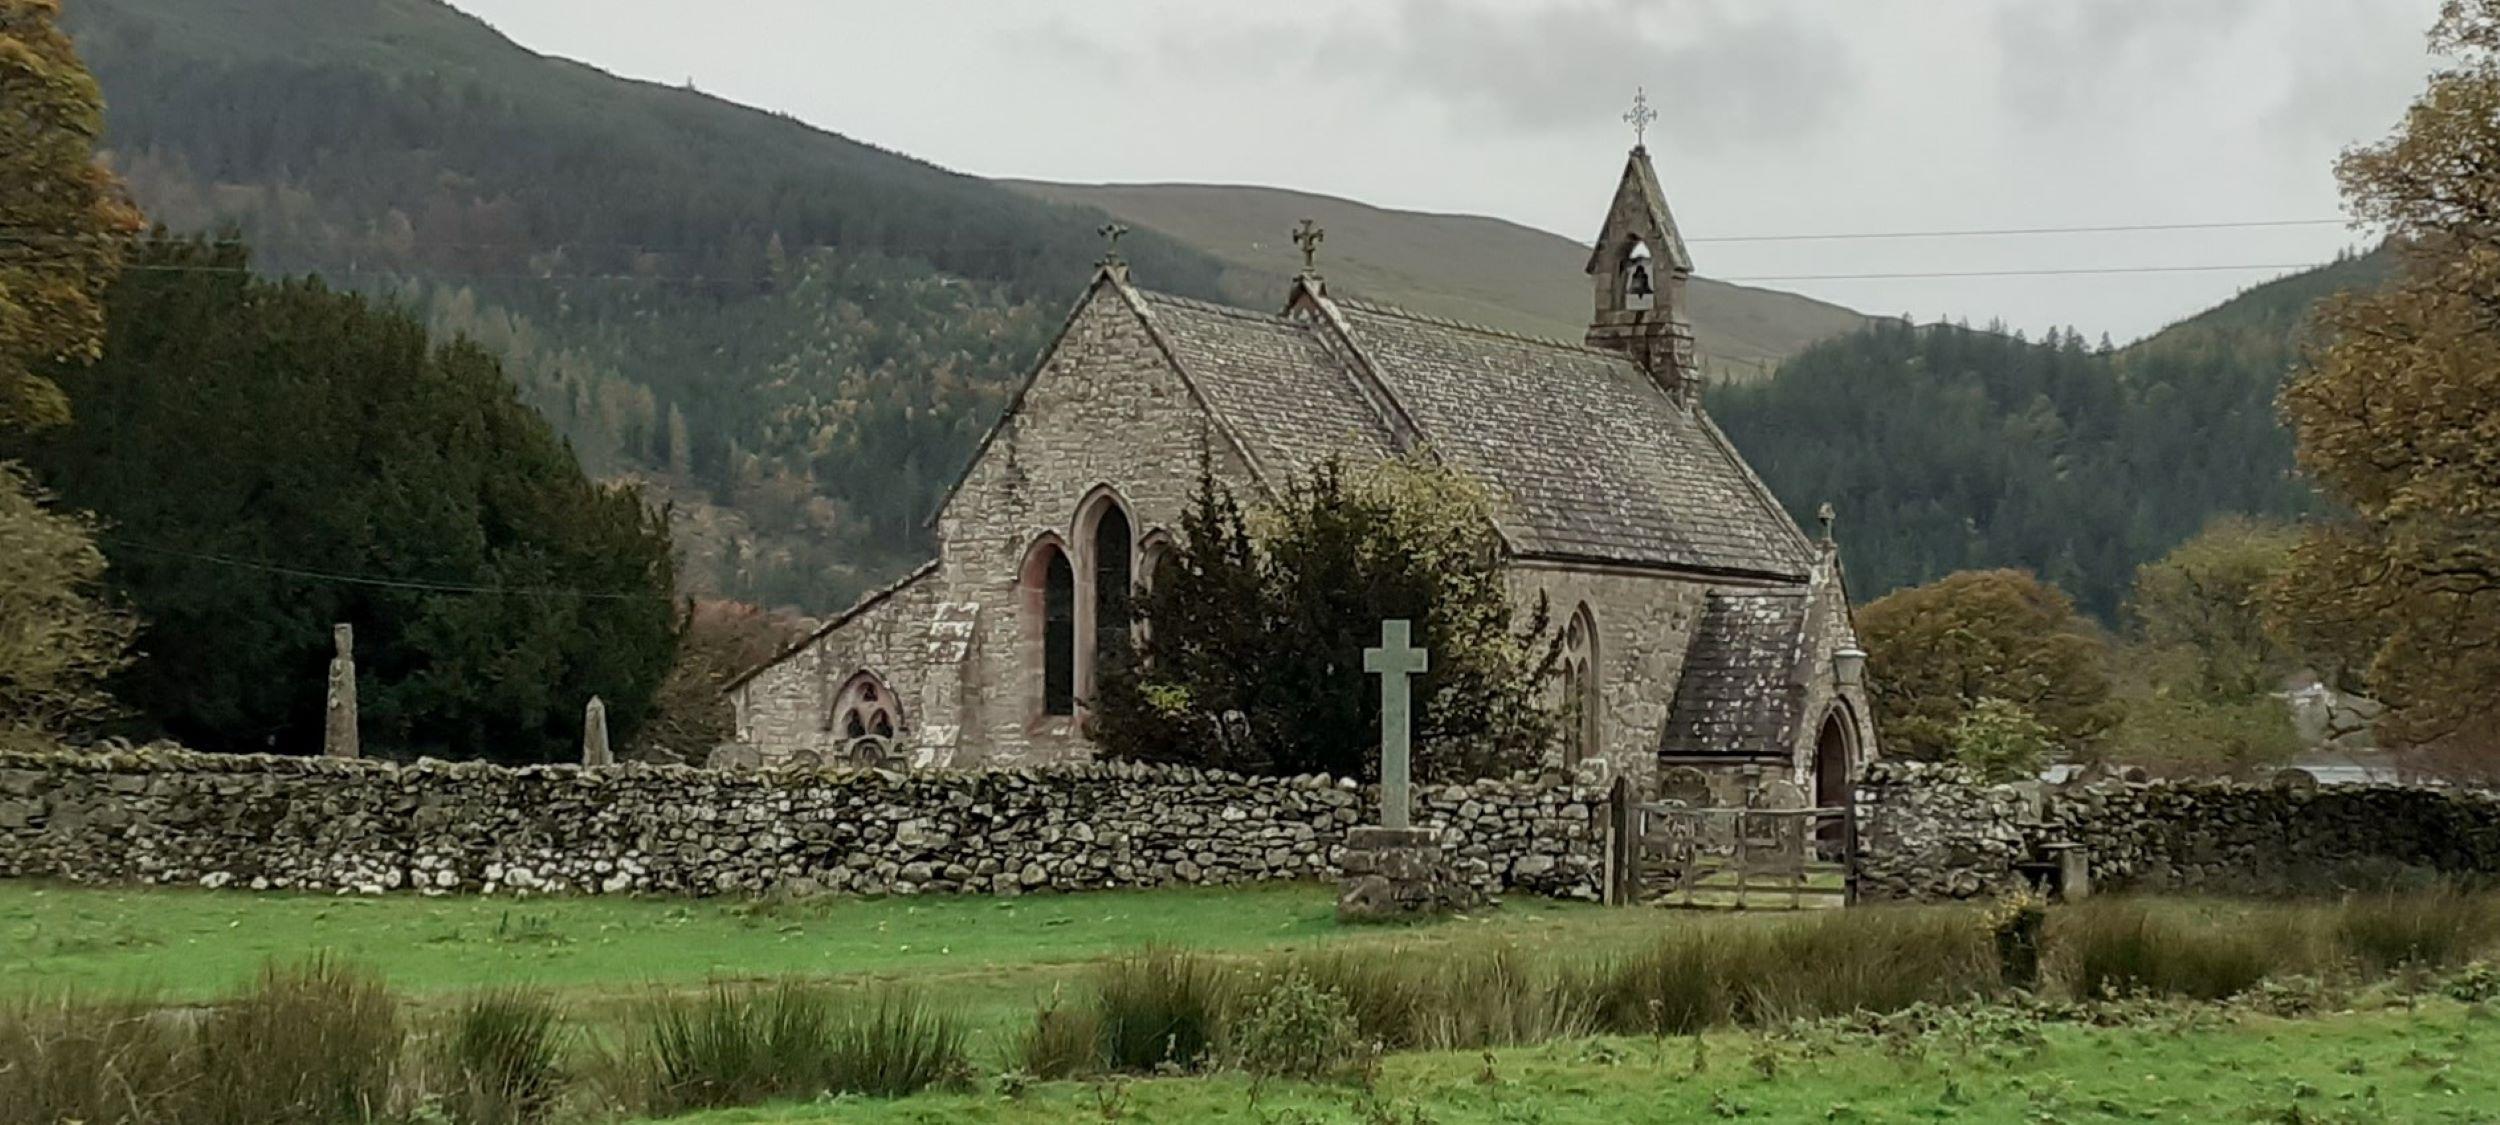 St Bega church, Bassenthwaite